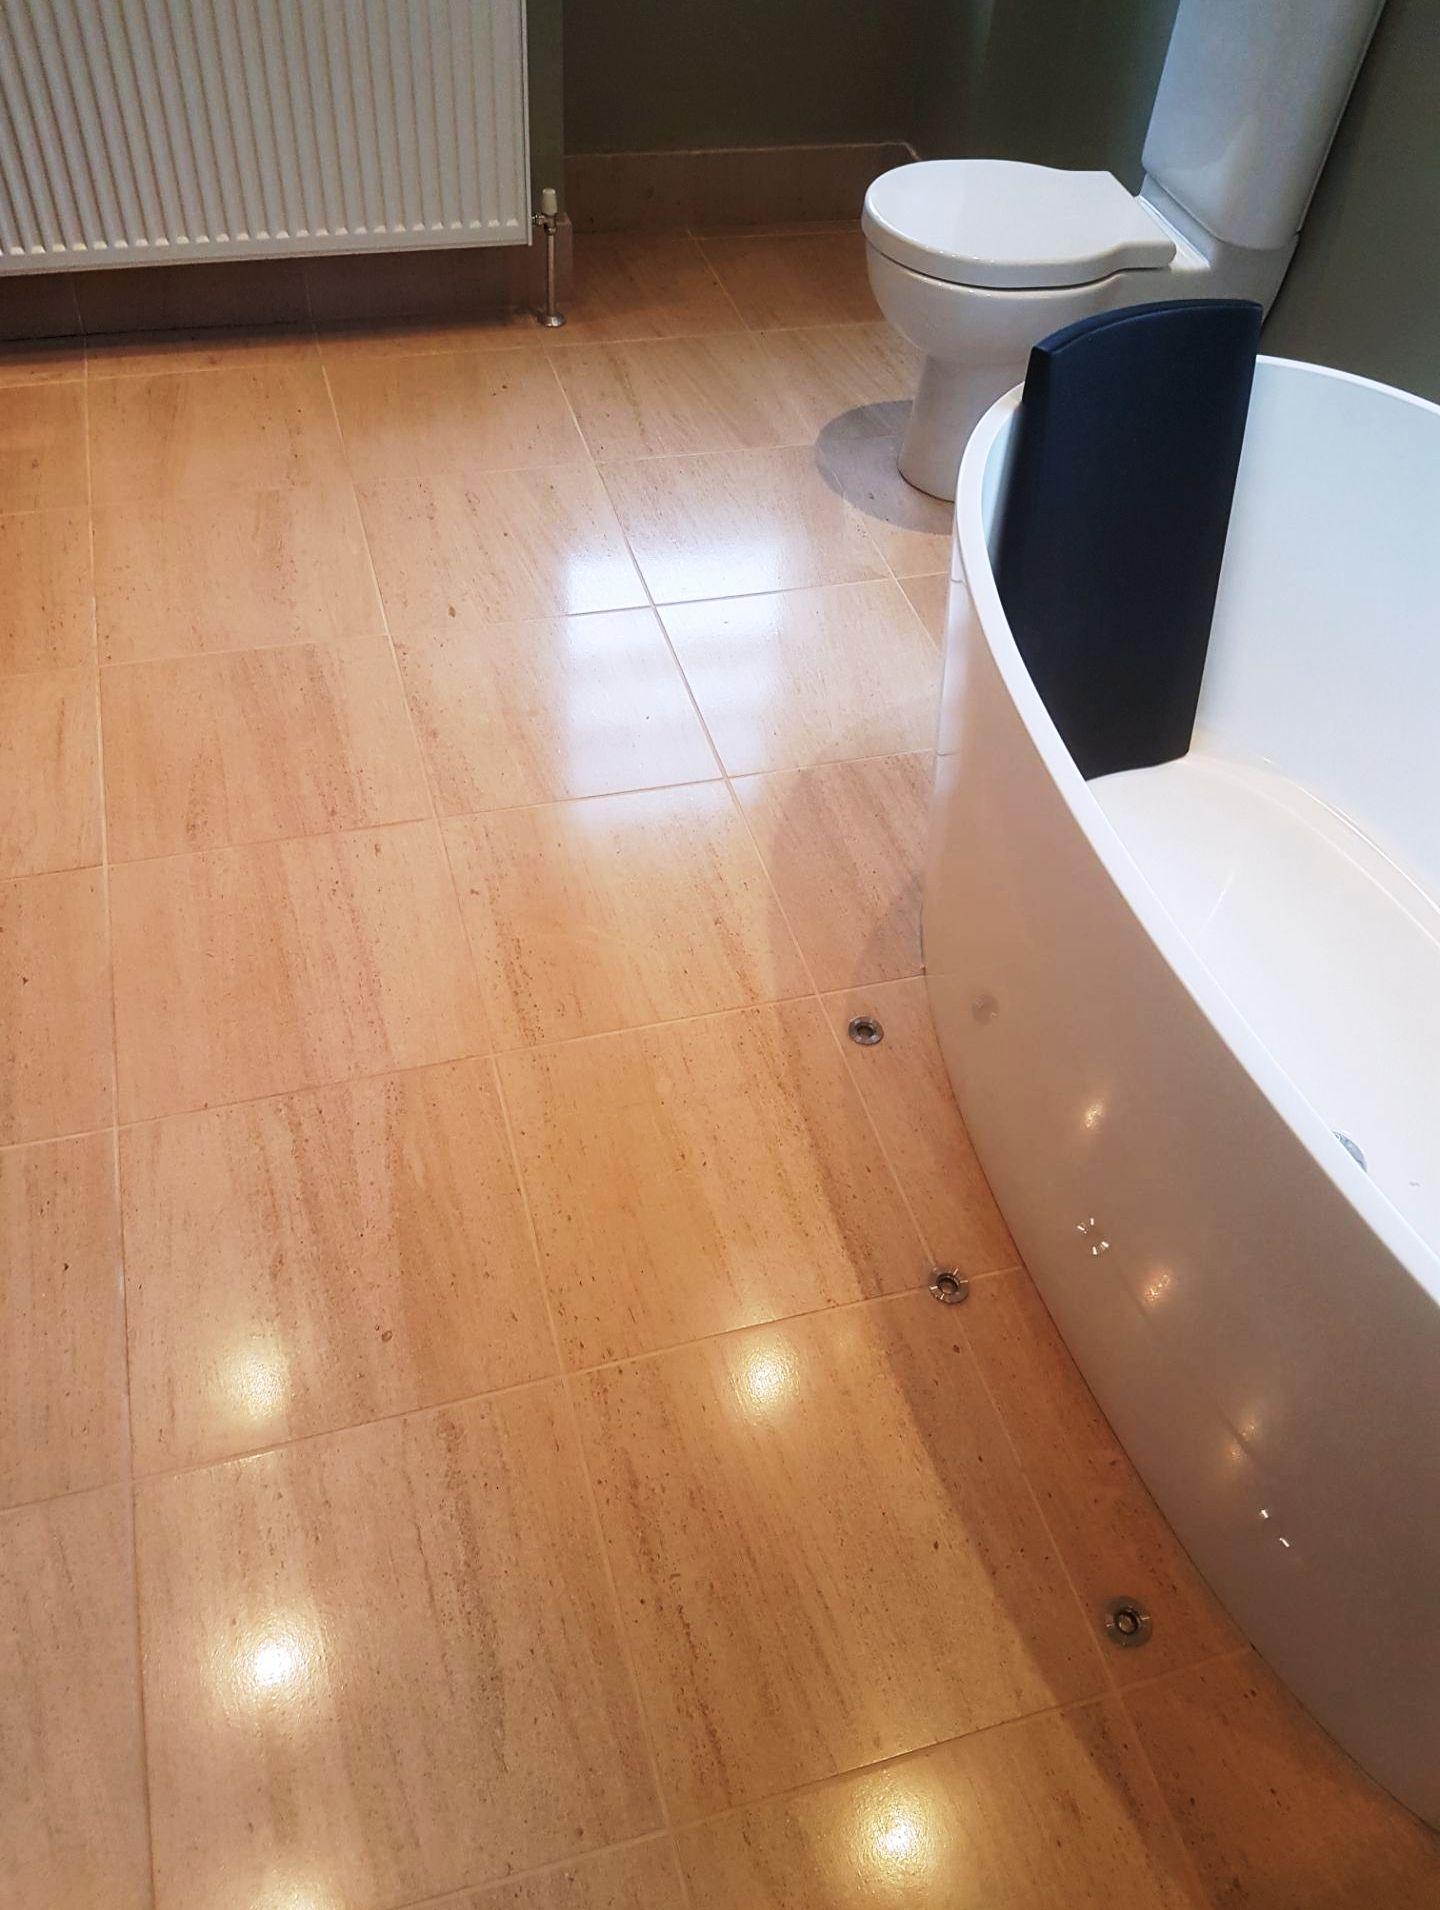 Limestone Bathroom Floor Merchiston after